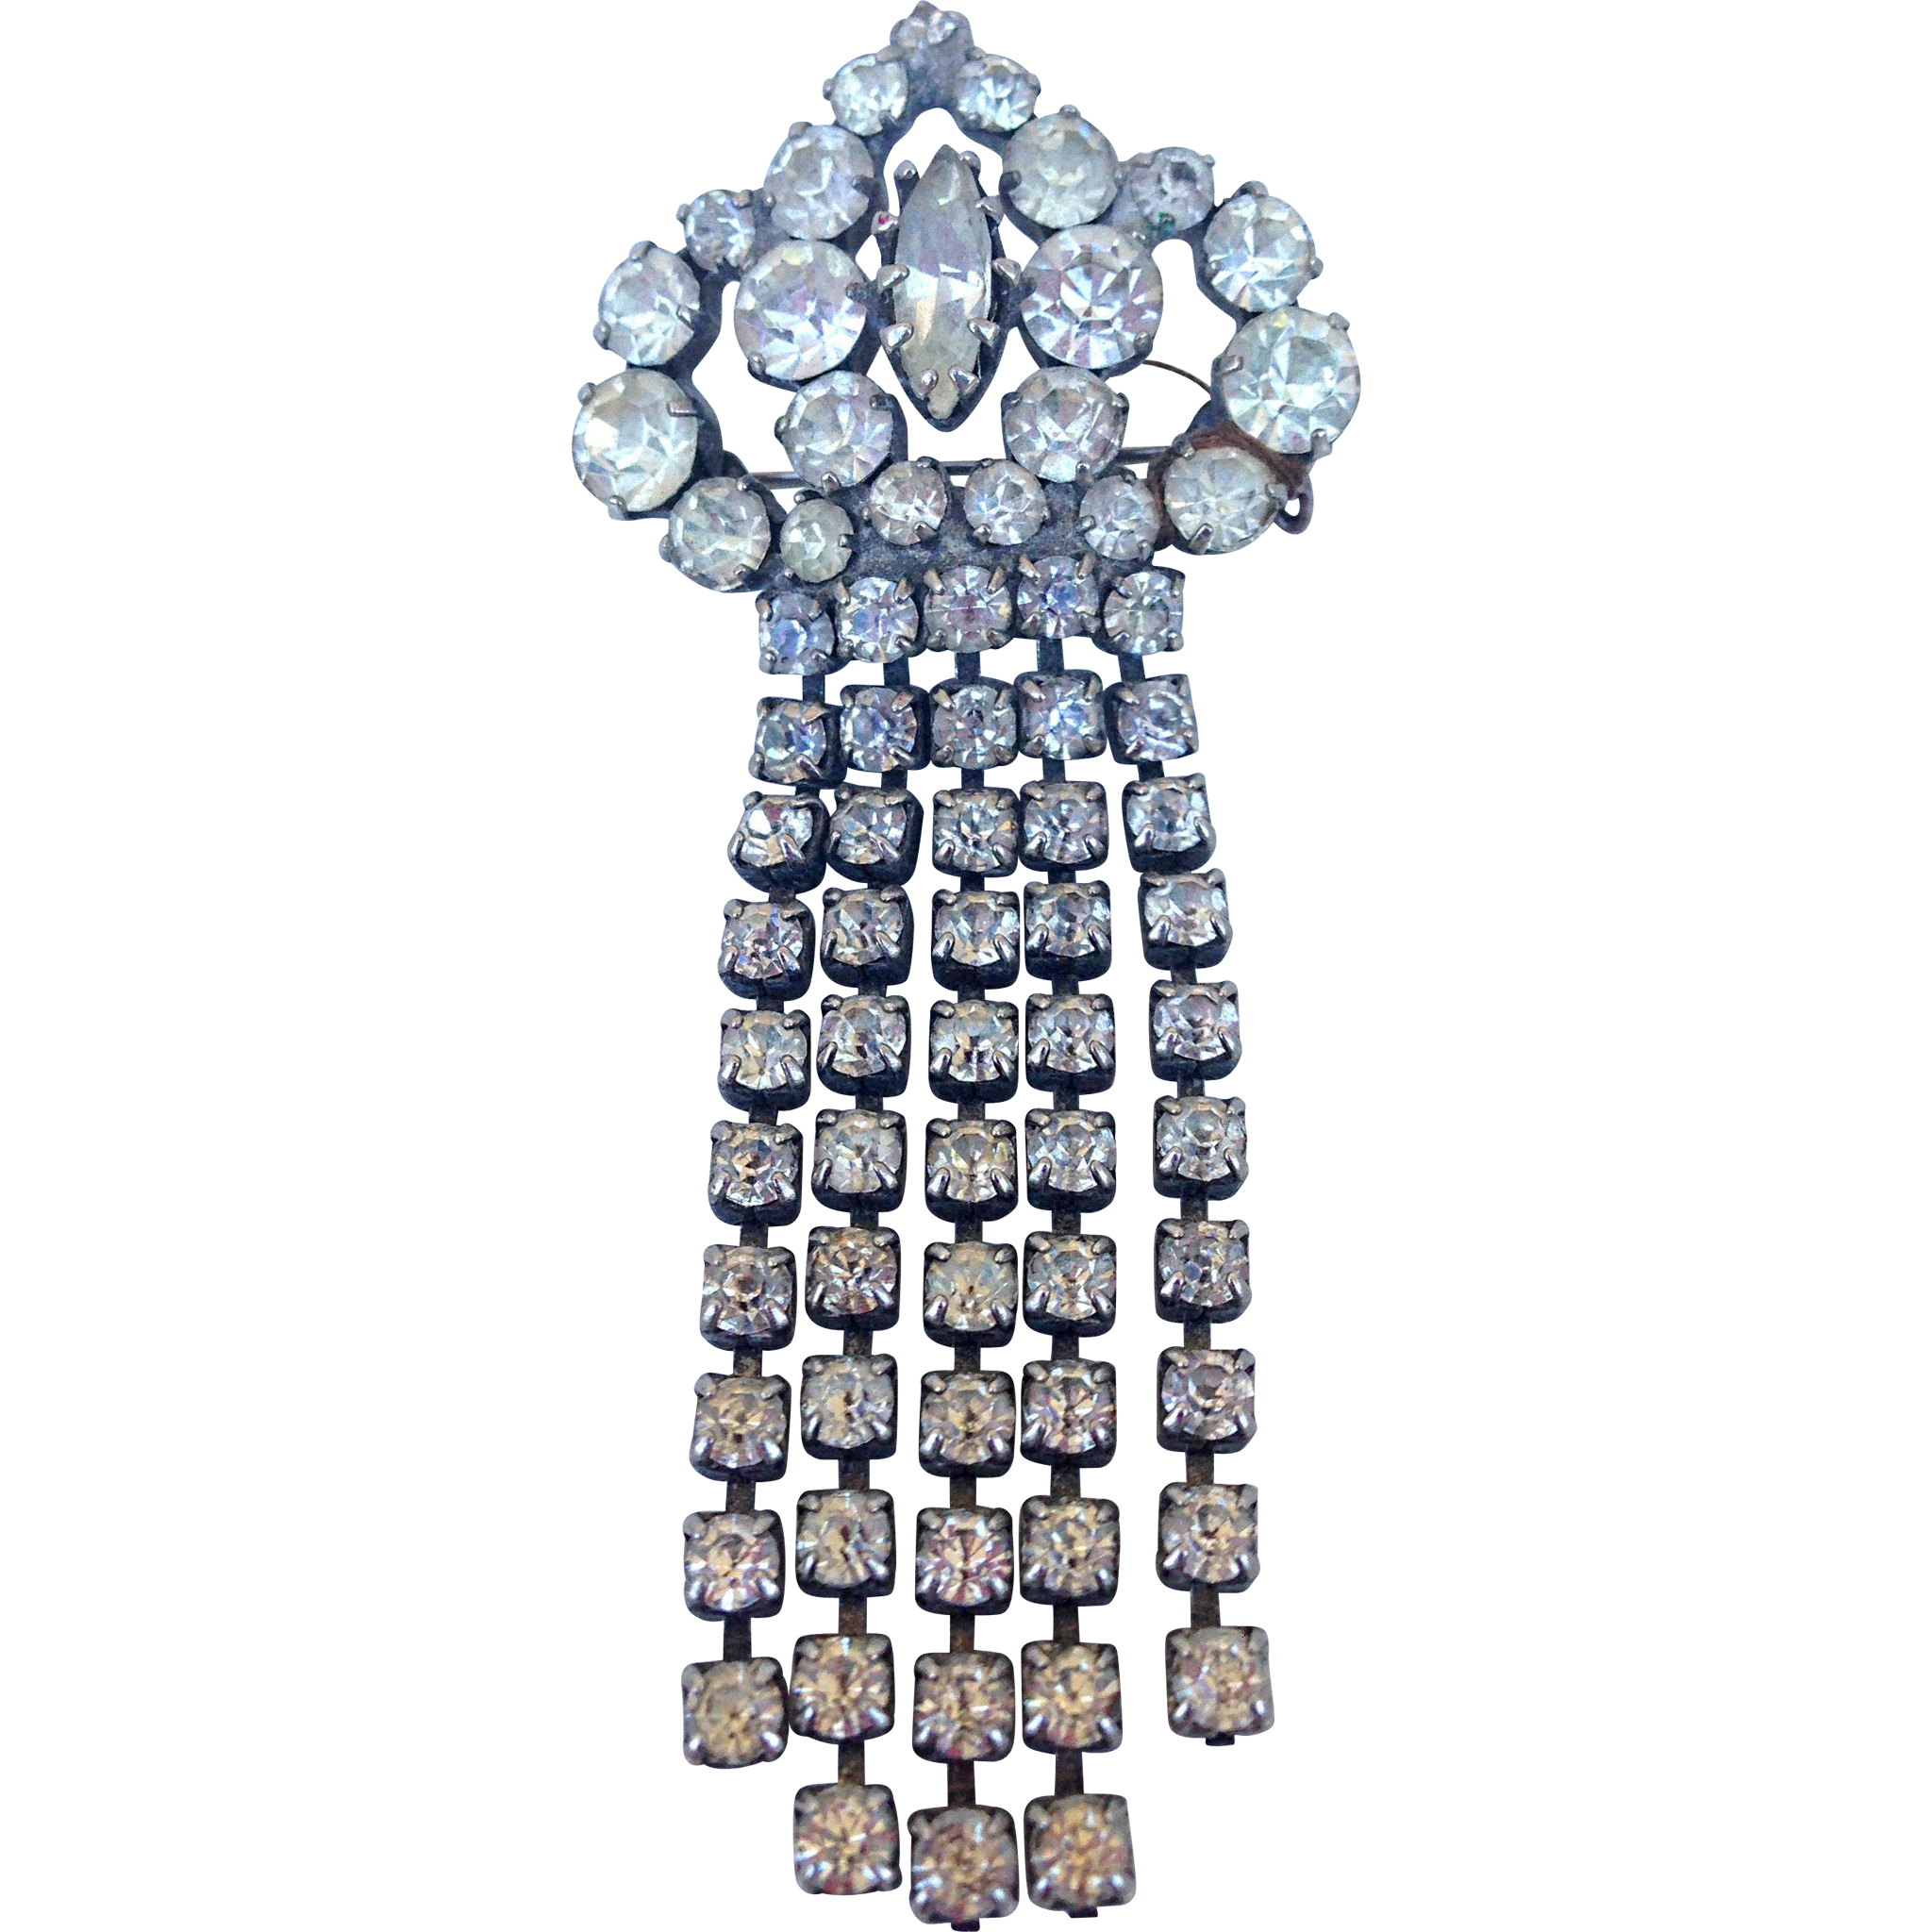 Excellence decoration old crystal brooch vintage flea market jewelry